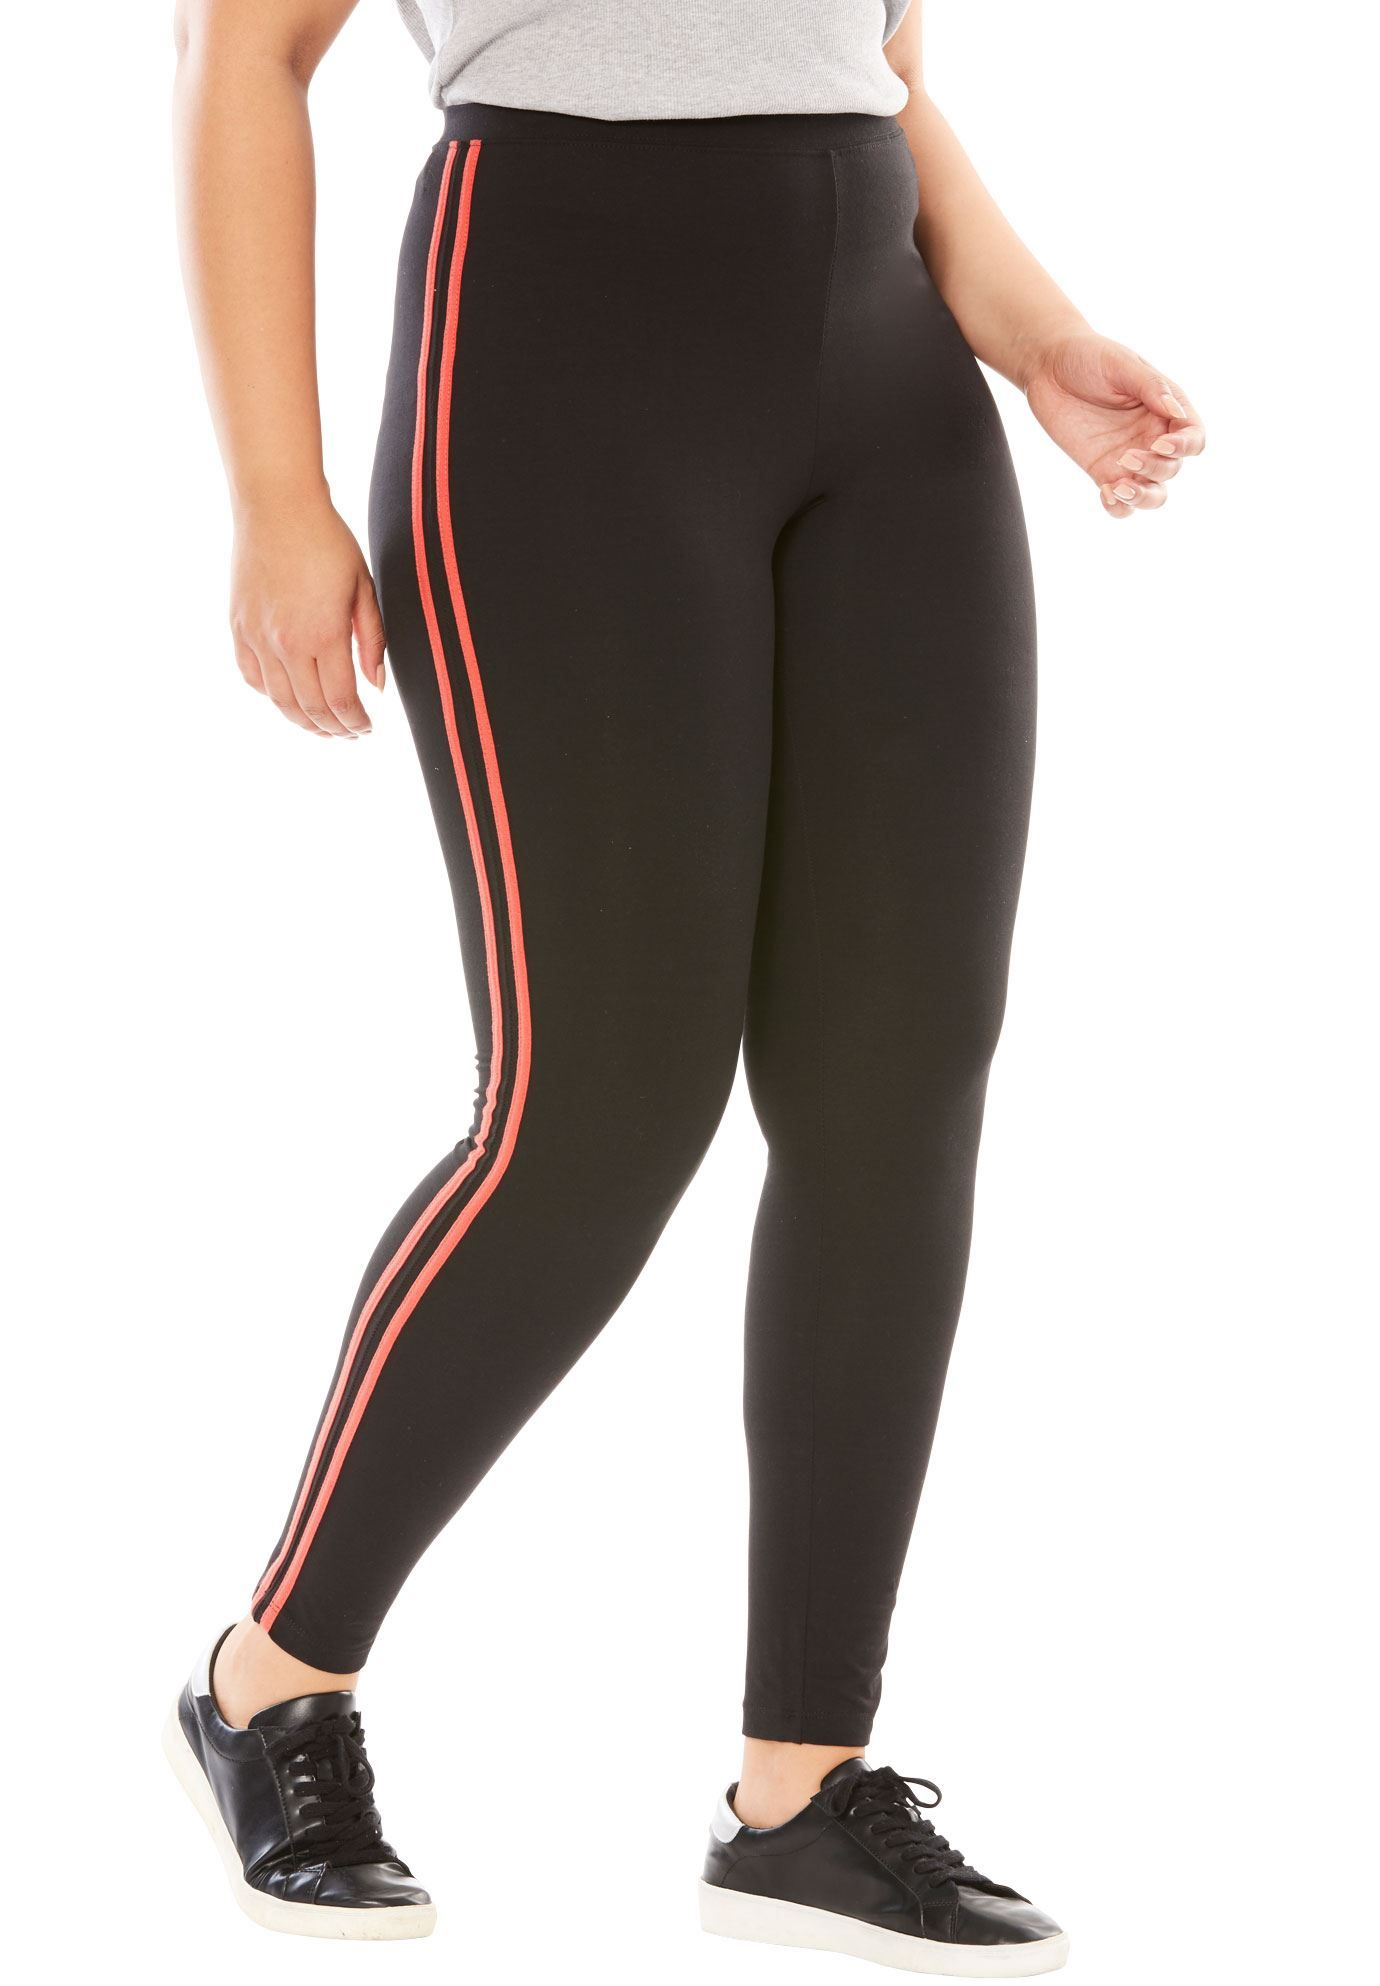 6ba978f01f815 Casual Stretch Knit Side Stripe Leggings - Women's Plus Size Clothing